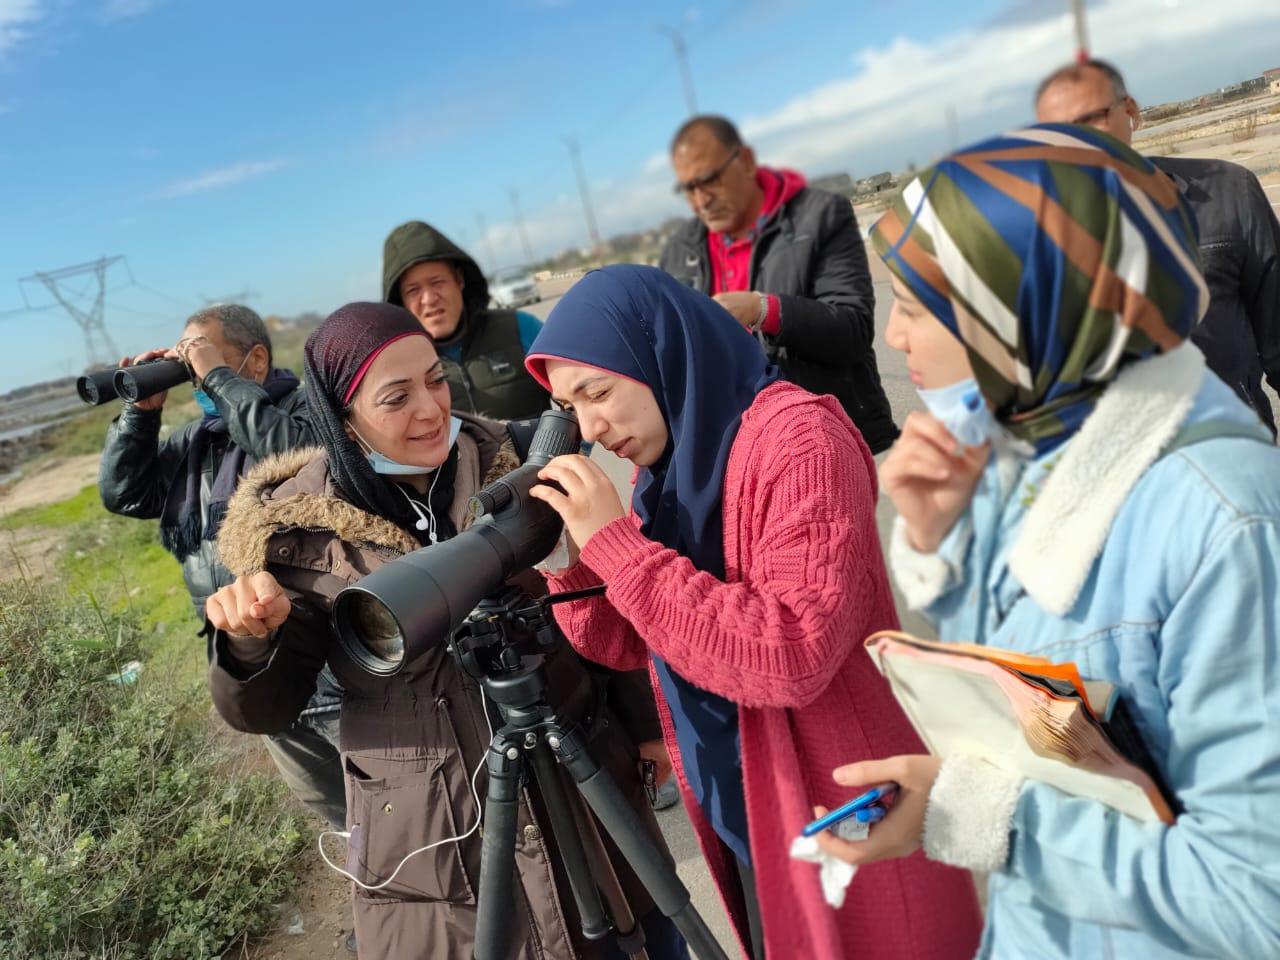 Students of Damietta University participating in the a count in Burullus Lake led by Dr. Basma Sheta © Basma Sheta